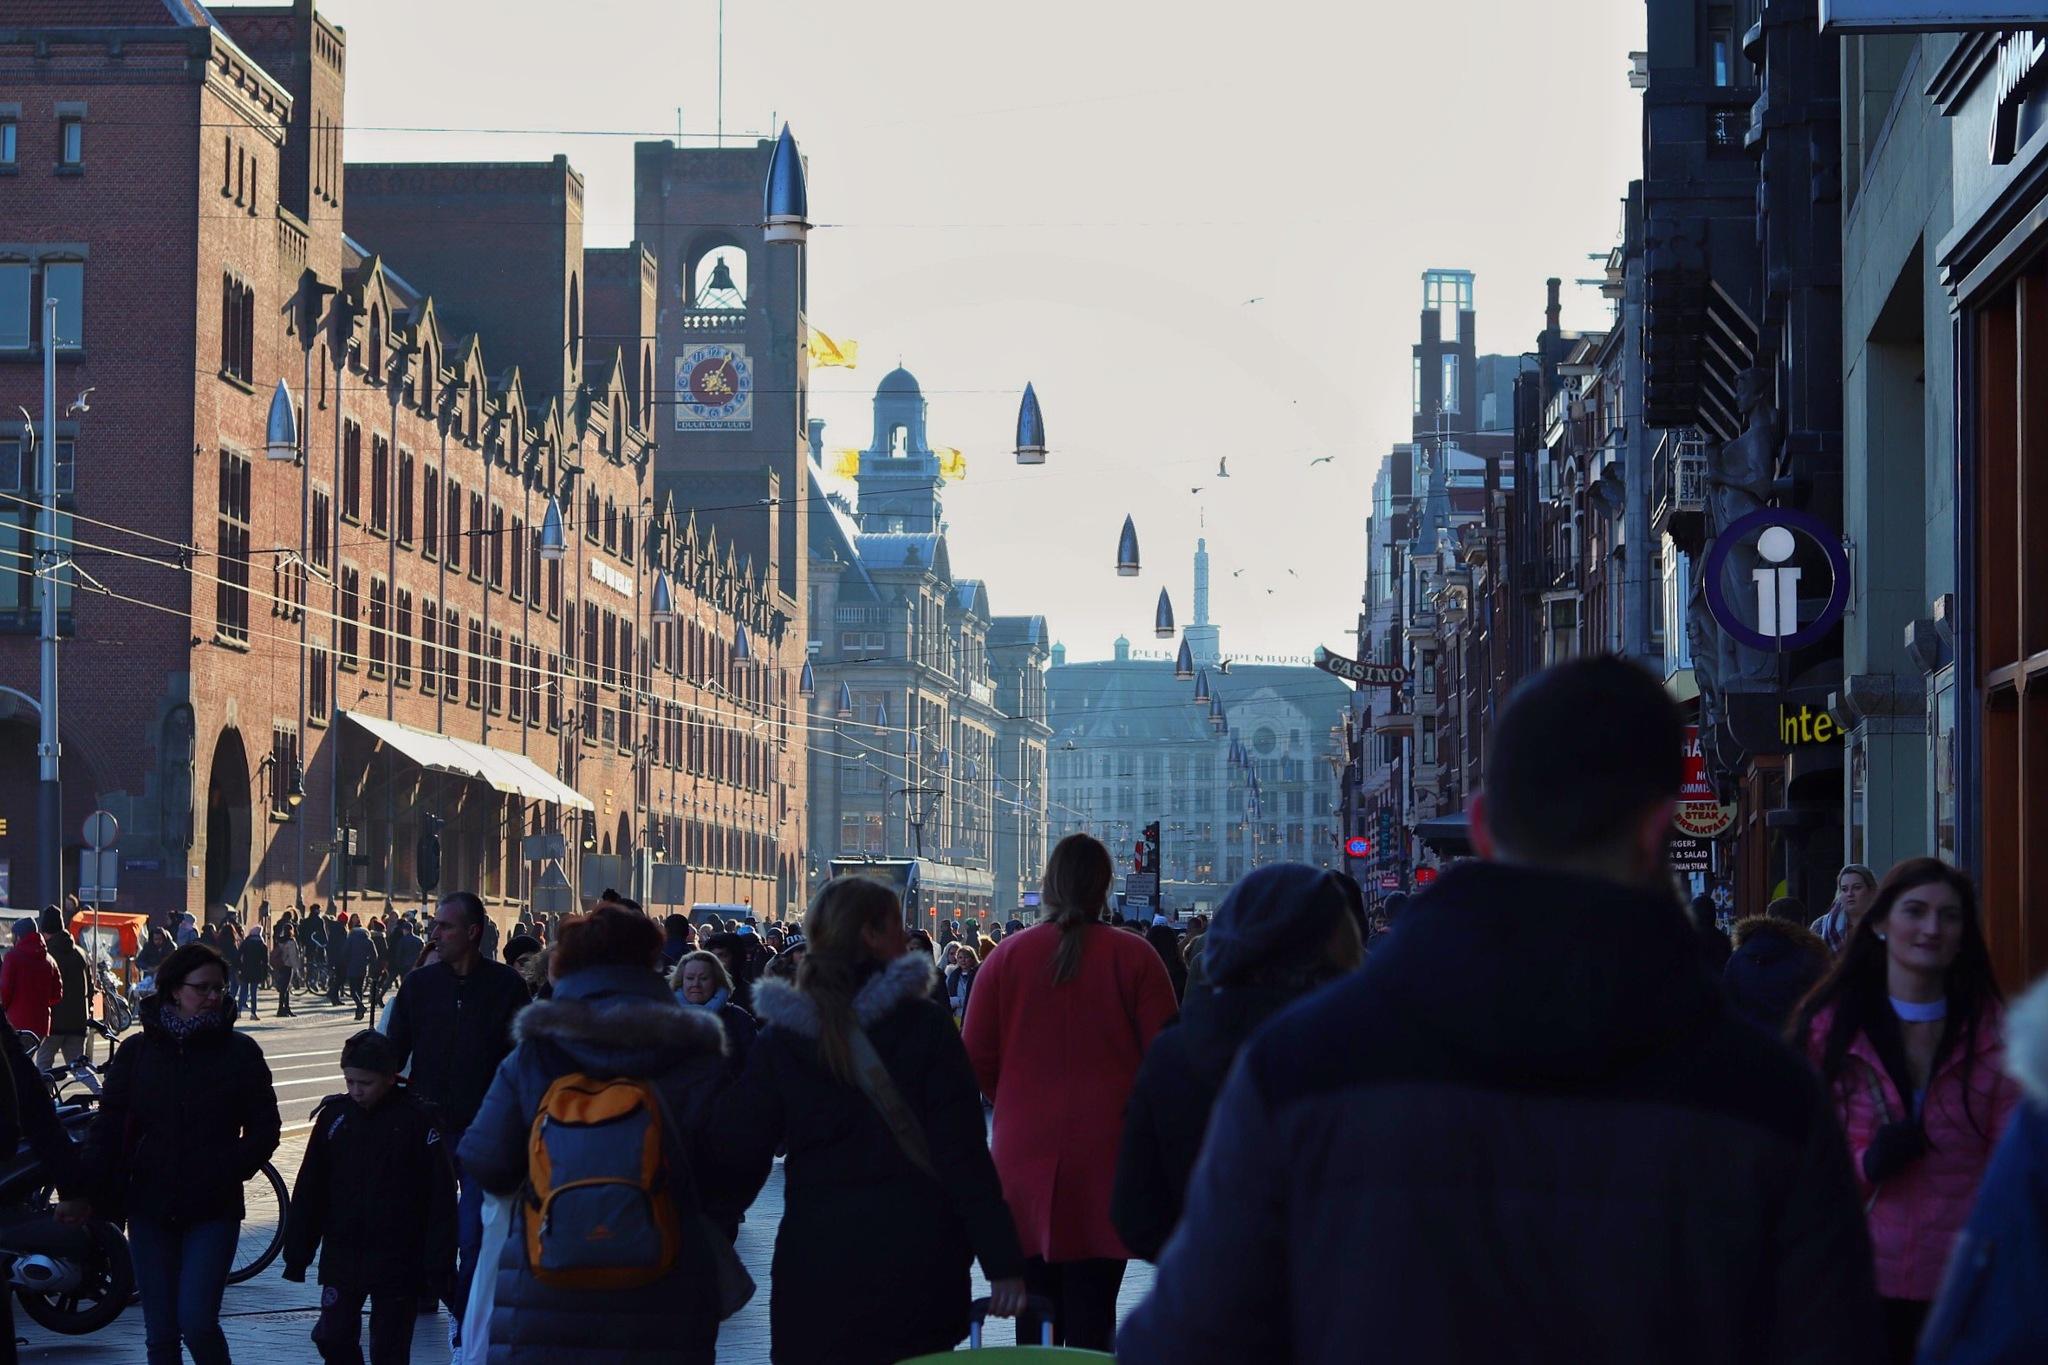 Nice scene of Amsterdam by Daniel Griffin